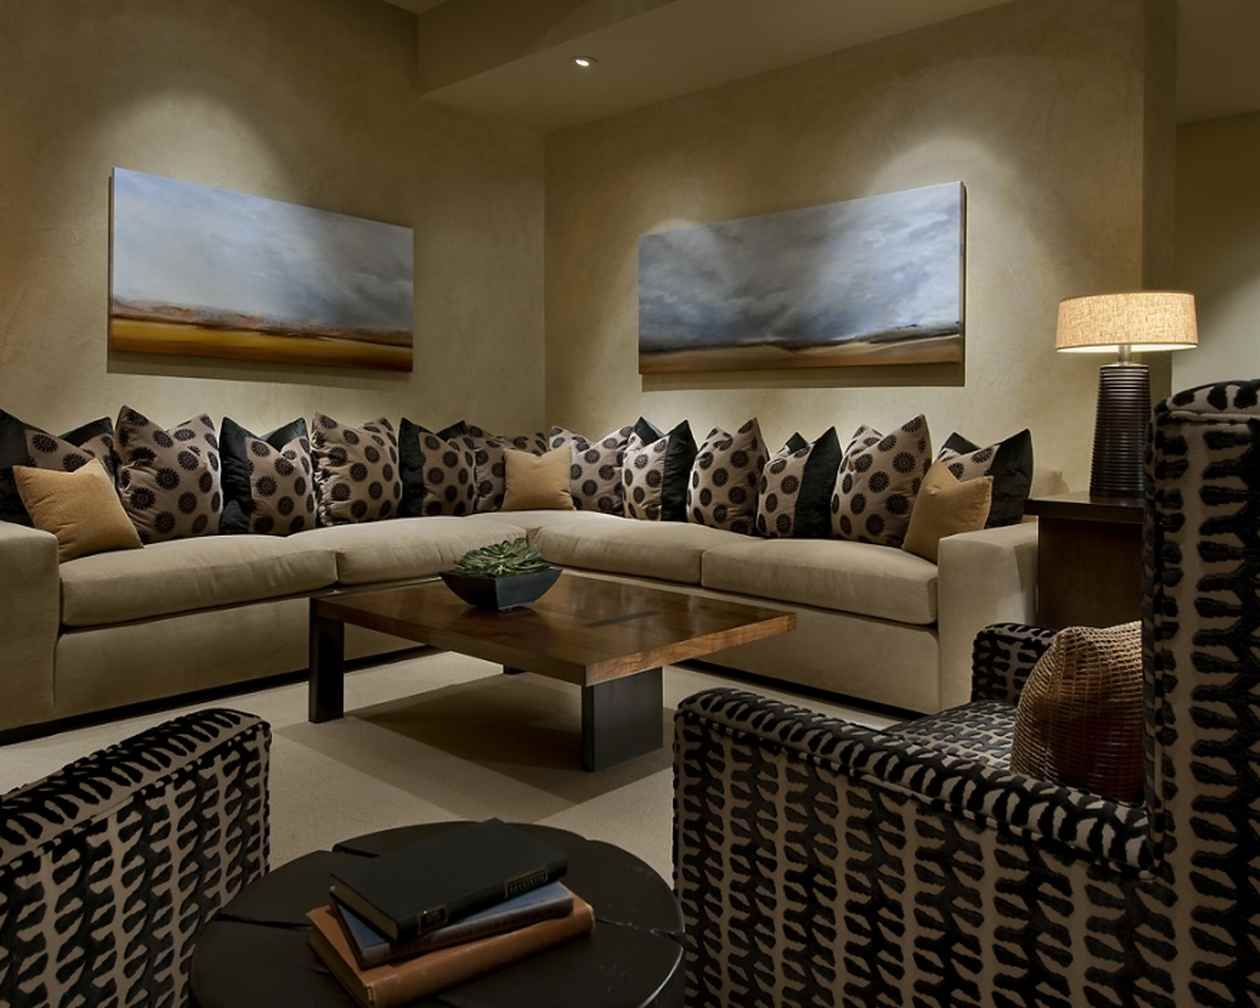 The home interior designs pictured here include the for Interior design living room description